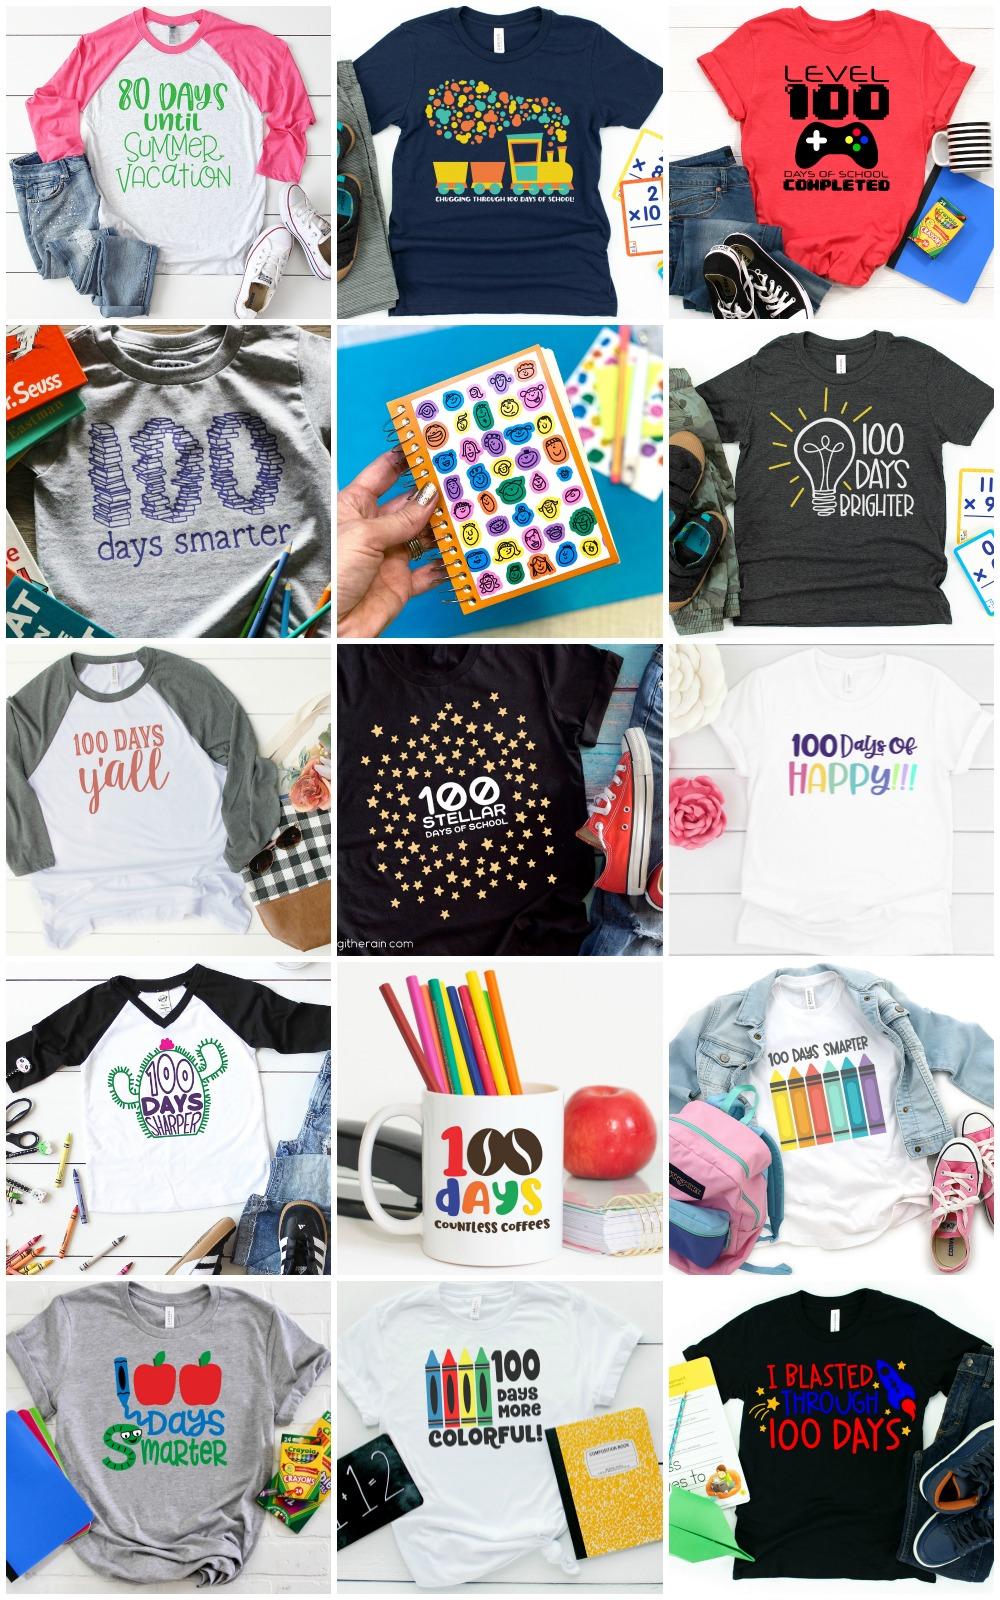 collage of 100 Days of school SVG designs